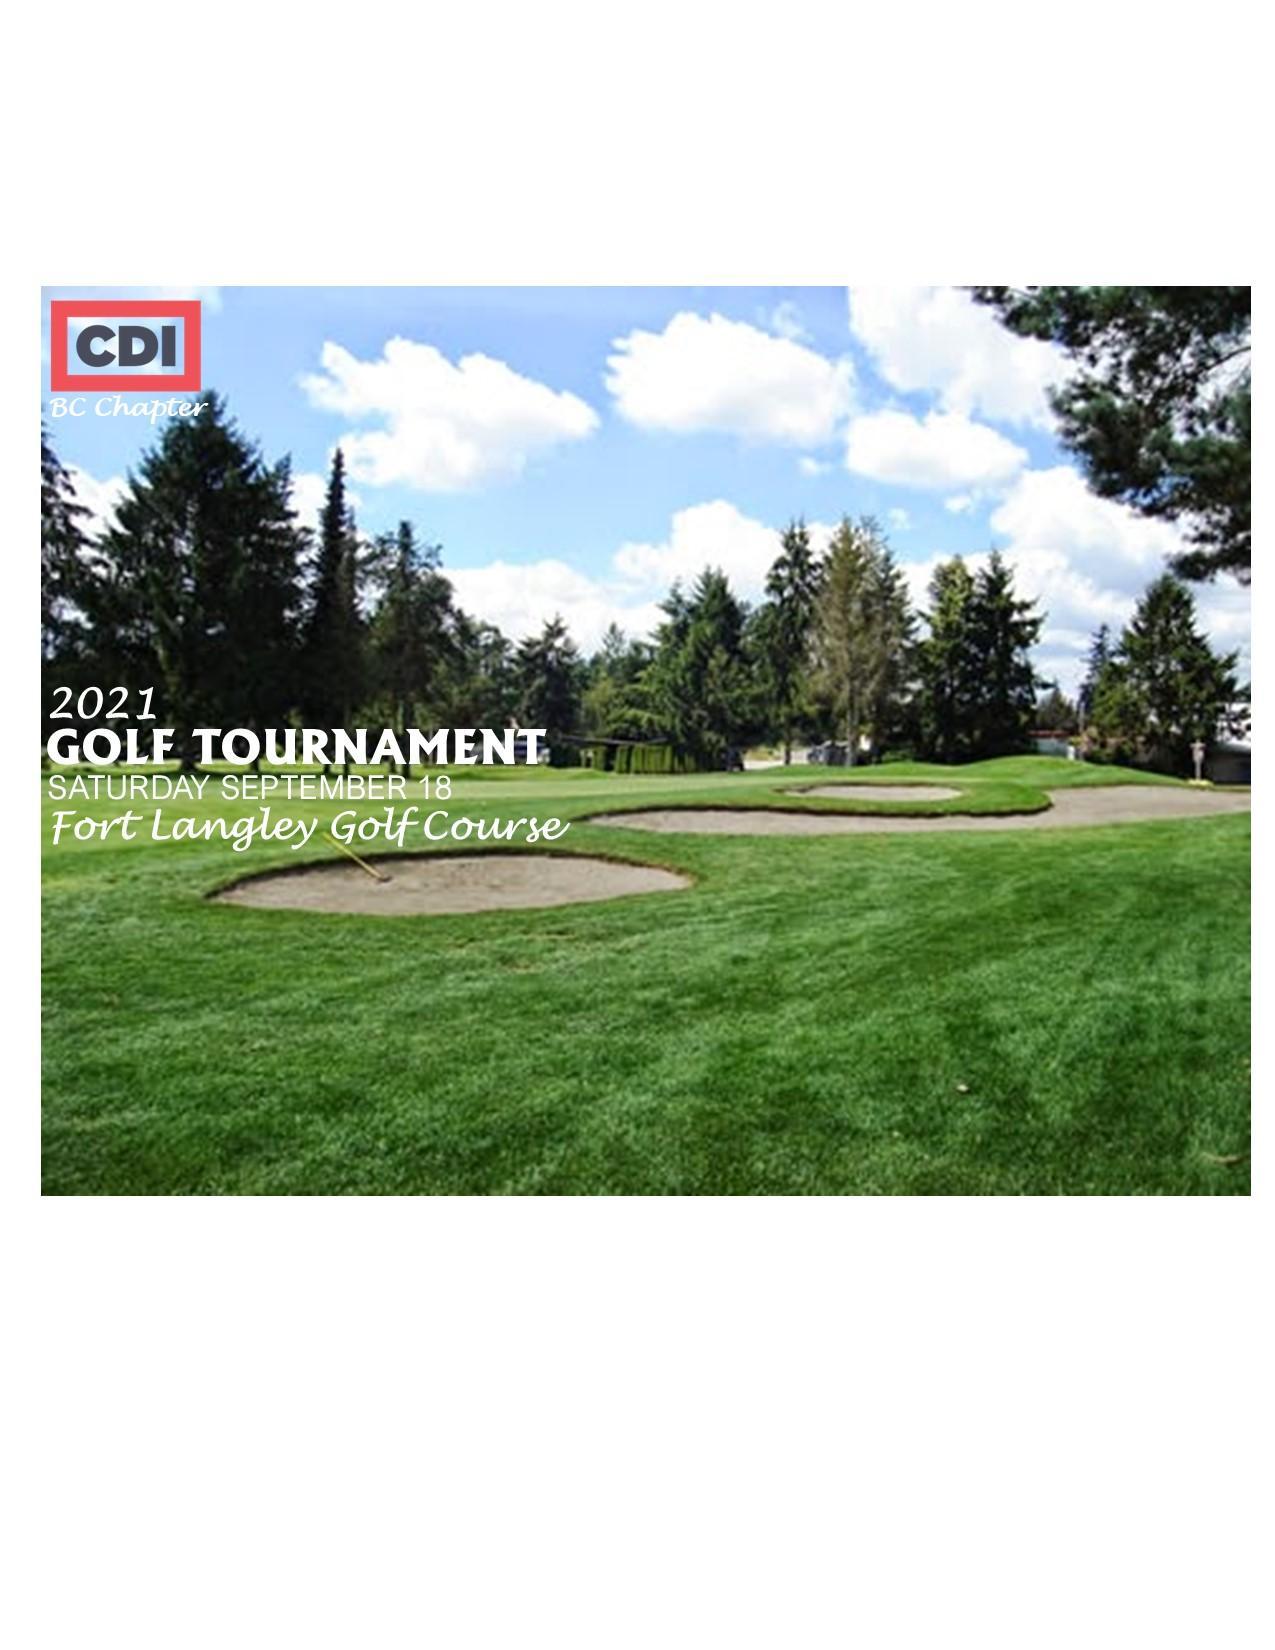 BC CDI Golf 2021